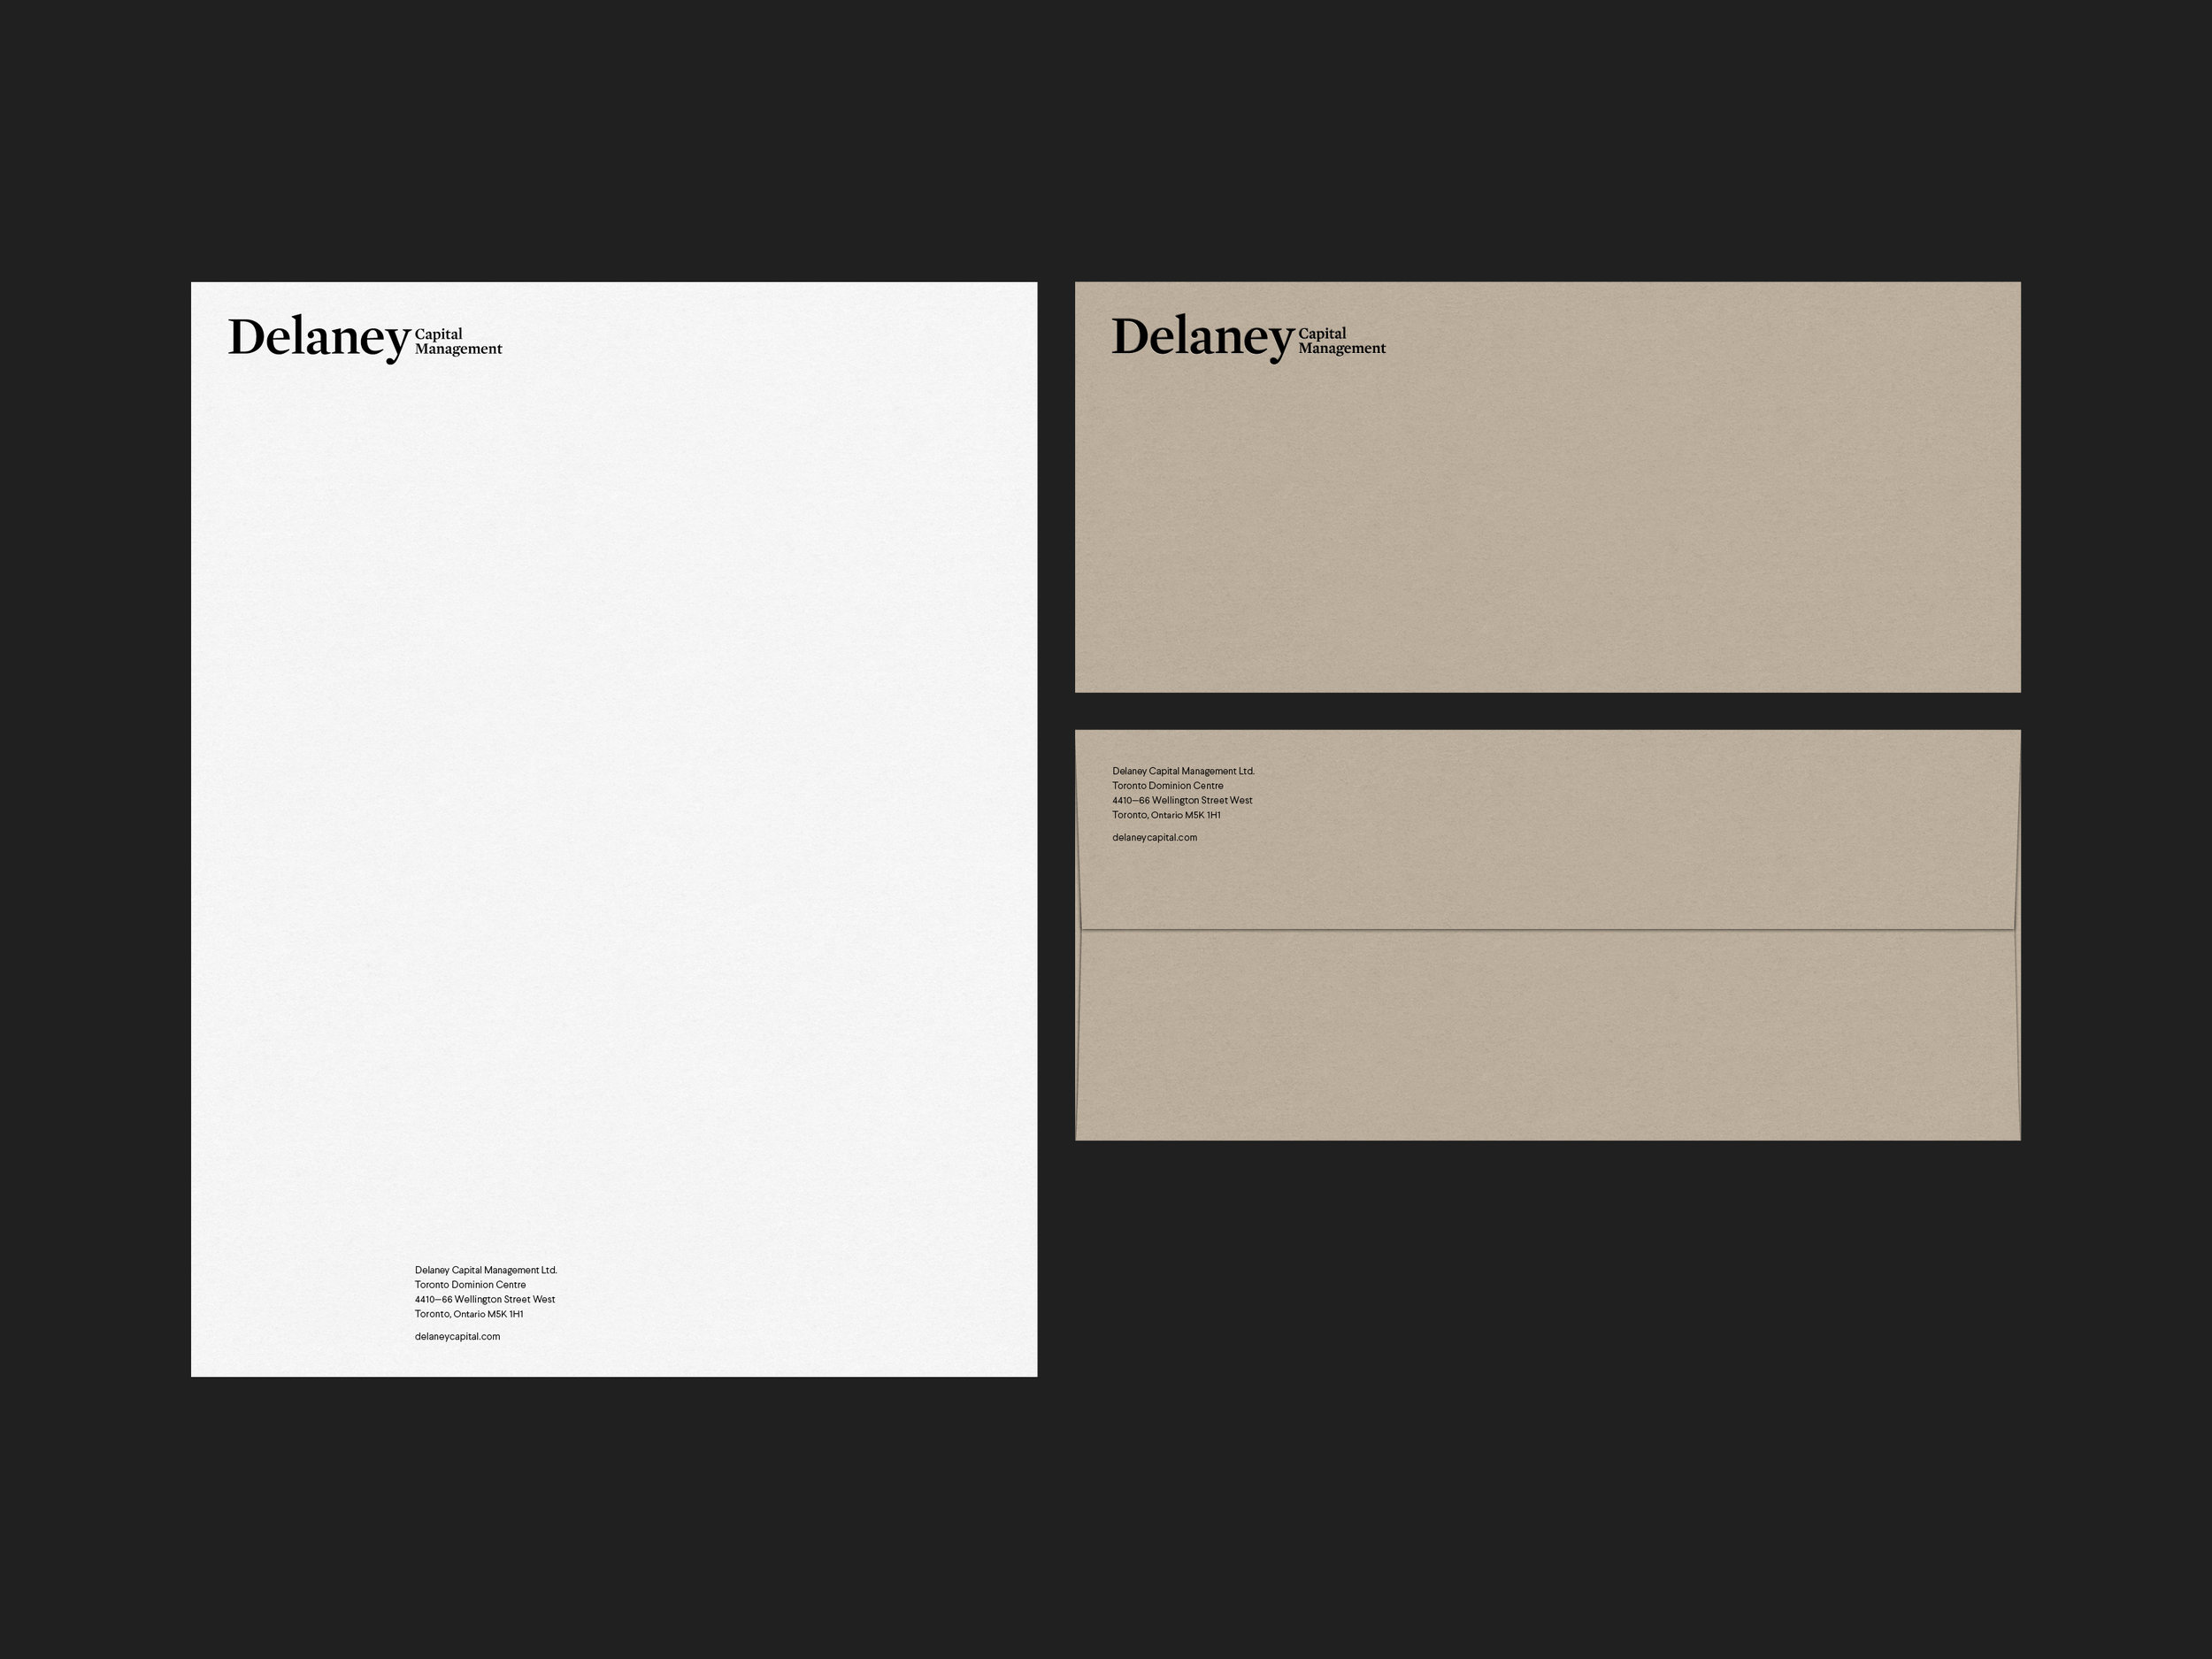 DELANEY_04.jpg